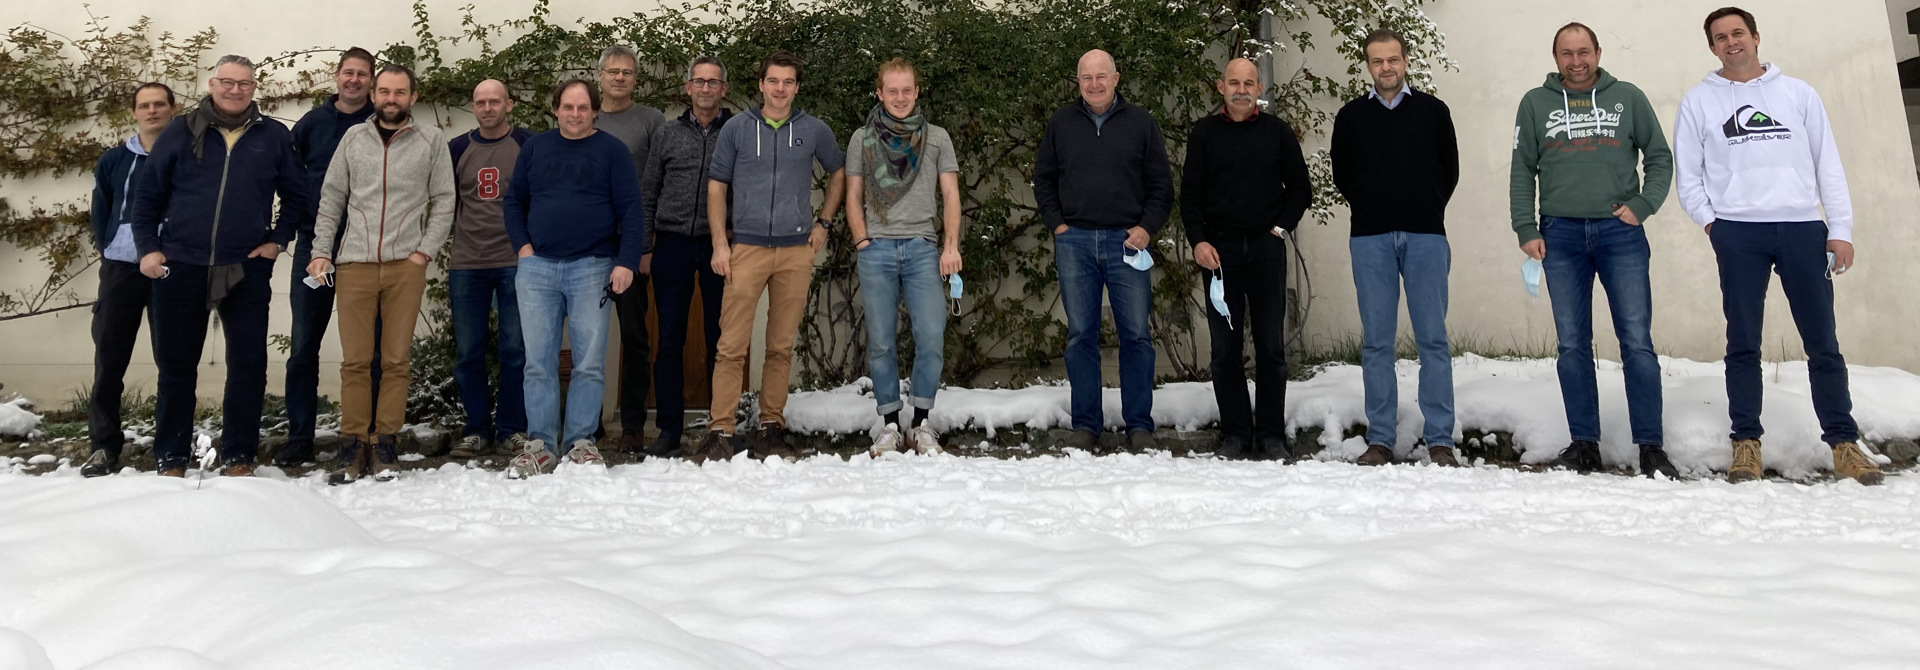 Workshop-Teilnehmer (Bild: K. Carrel, Strickhof)>